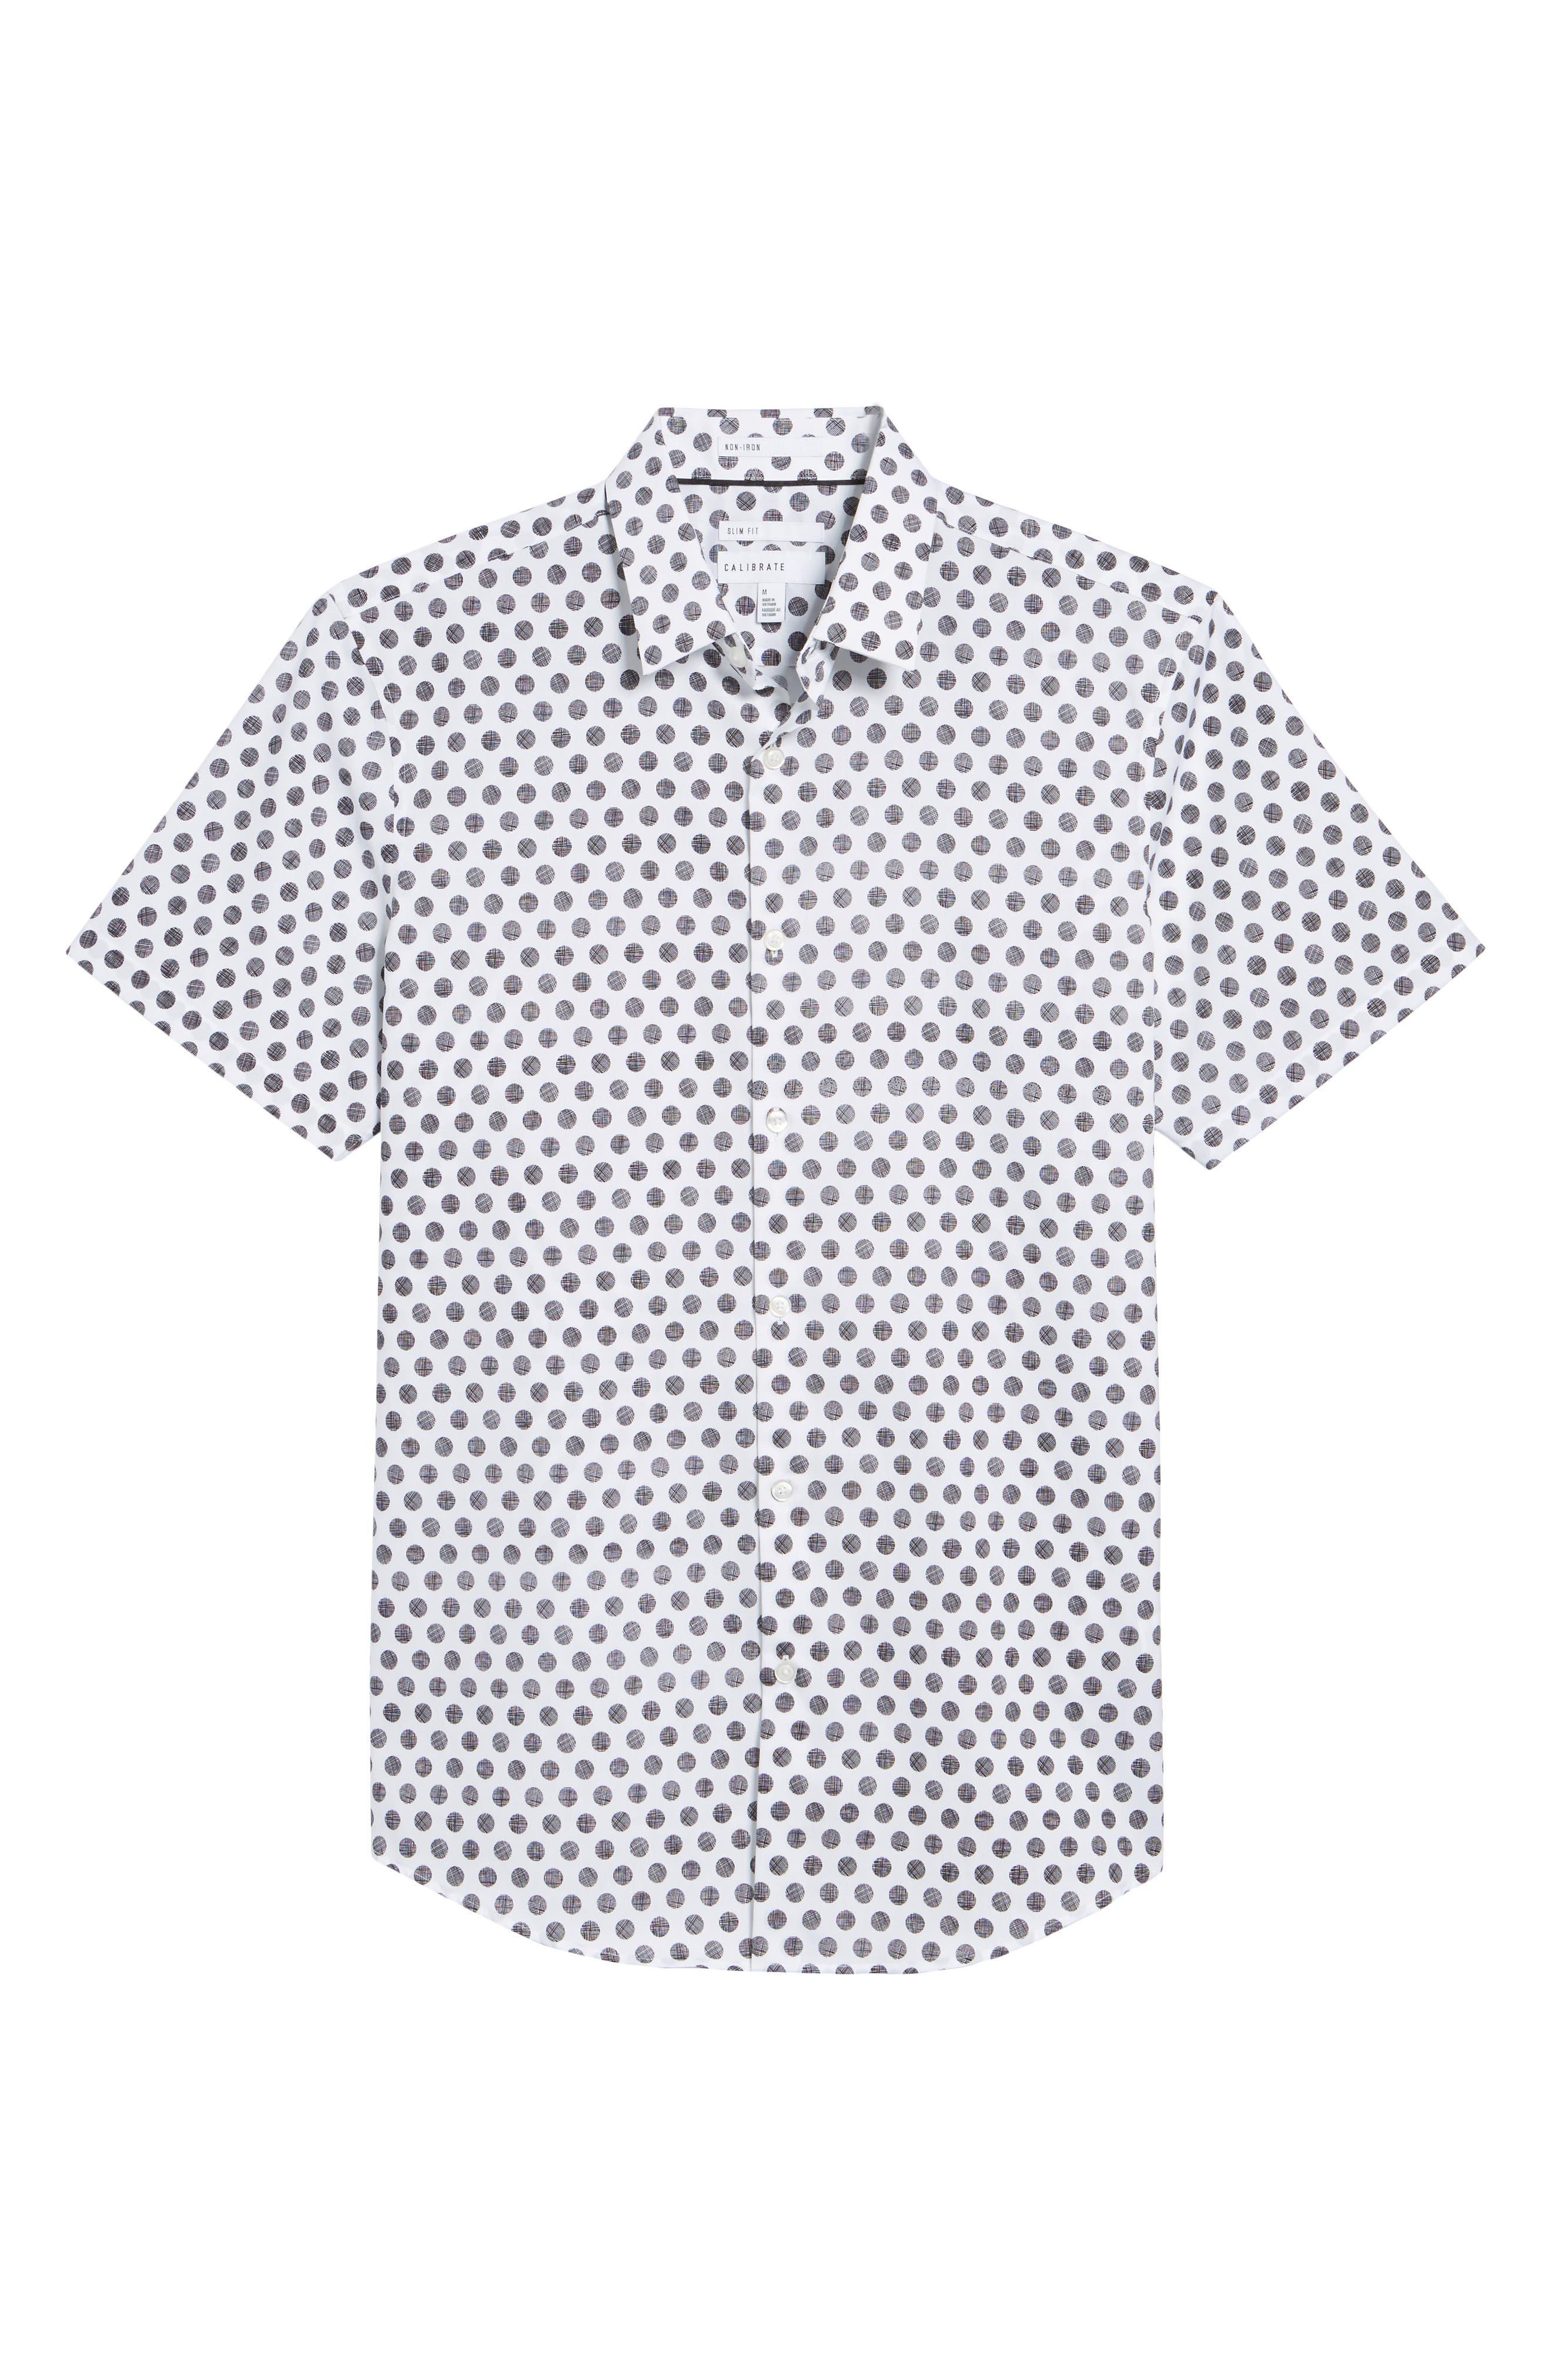 Dot Sport Shirt,                             Alternate thumbnail 6, color,                             White Black Hatch Dot